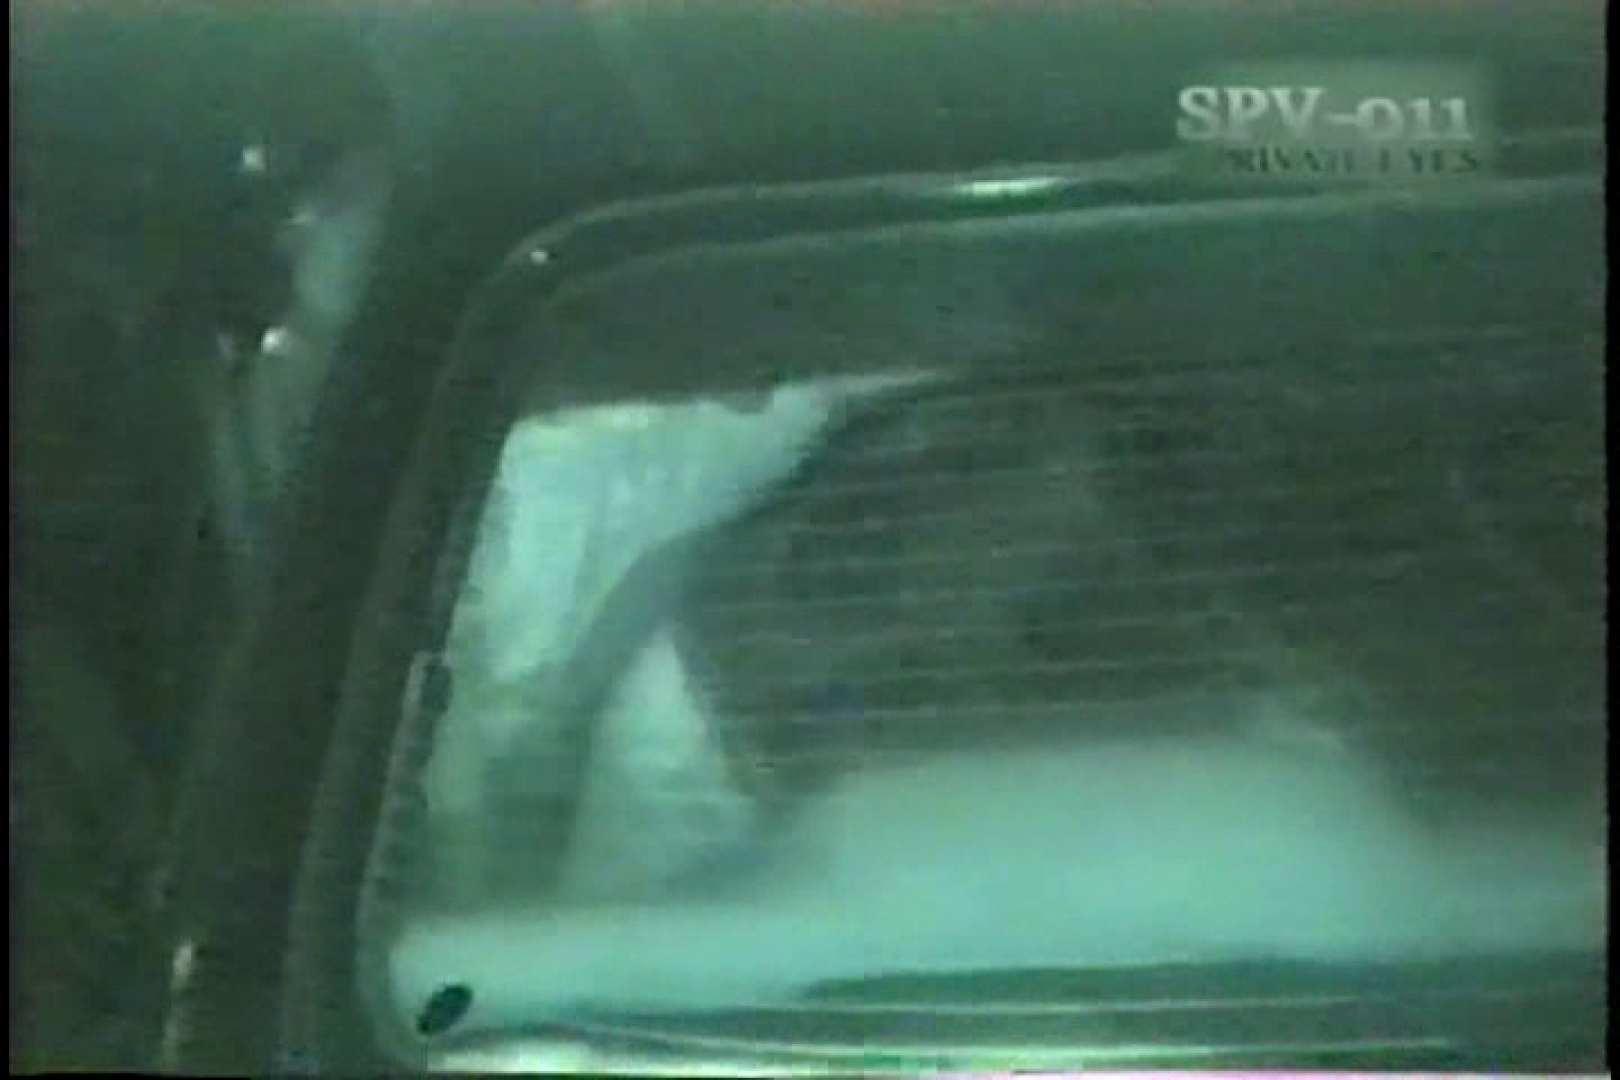 高画質版!SPD-011 盗撮 カーセックス黙示録 (VHS) 高画質 | 女体盗撮  104連発 79